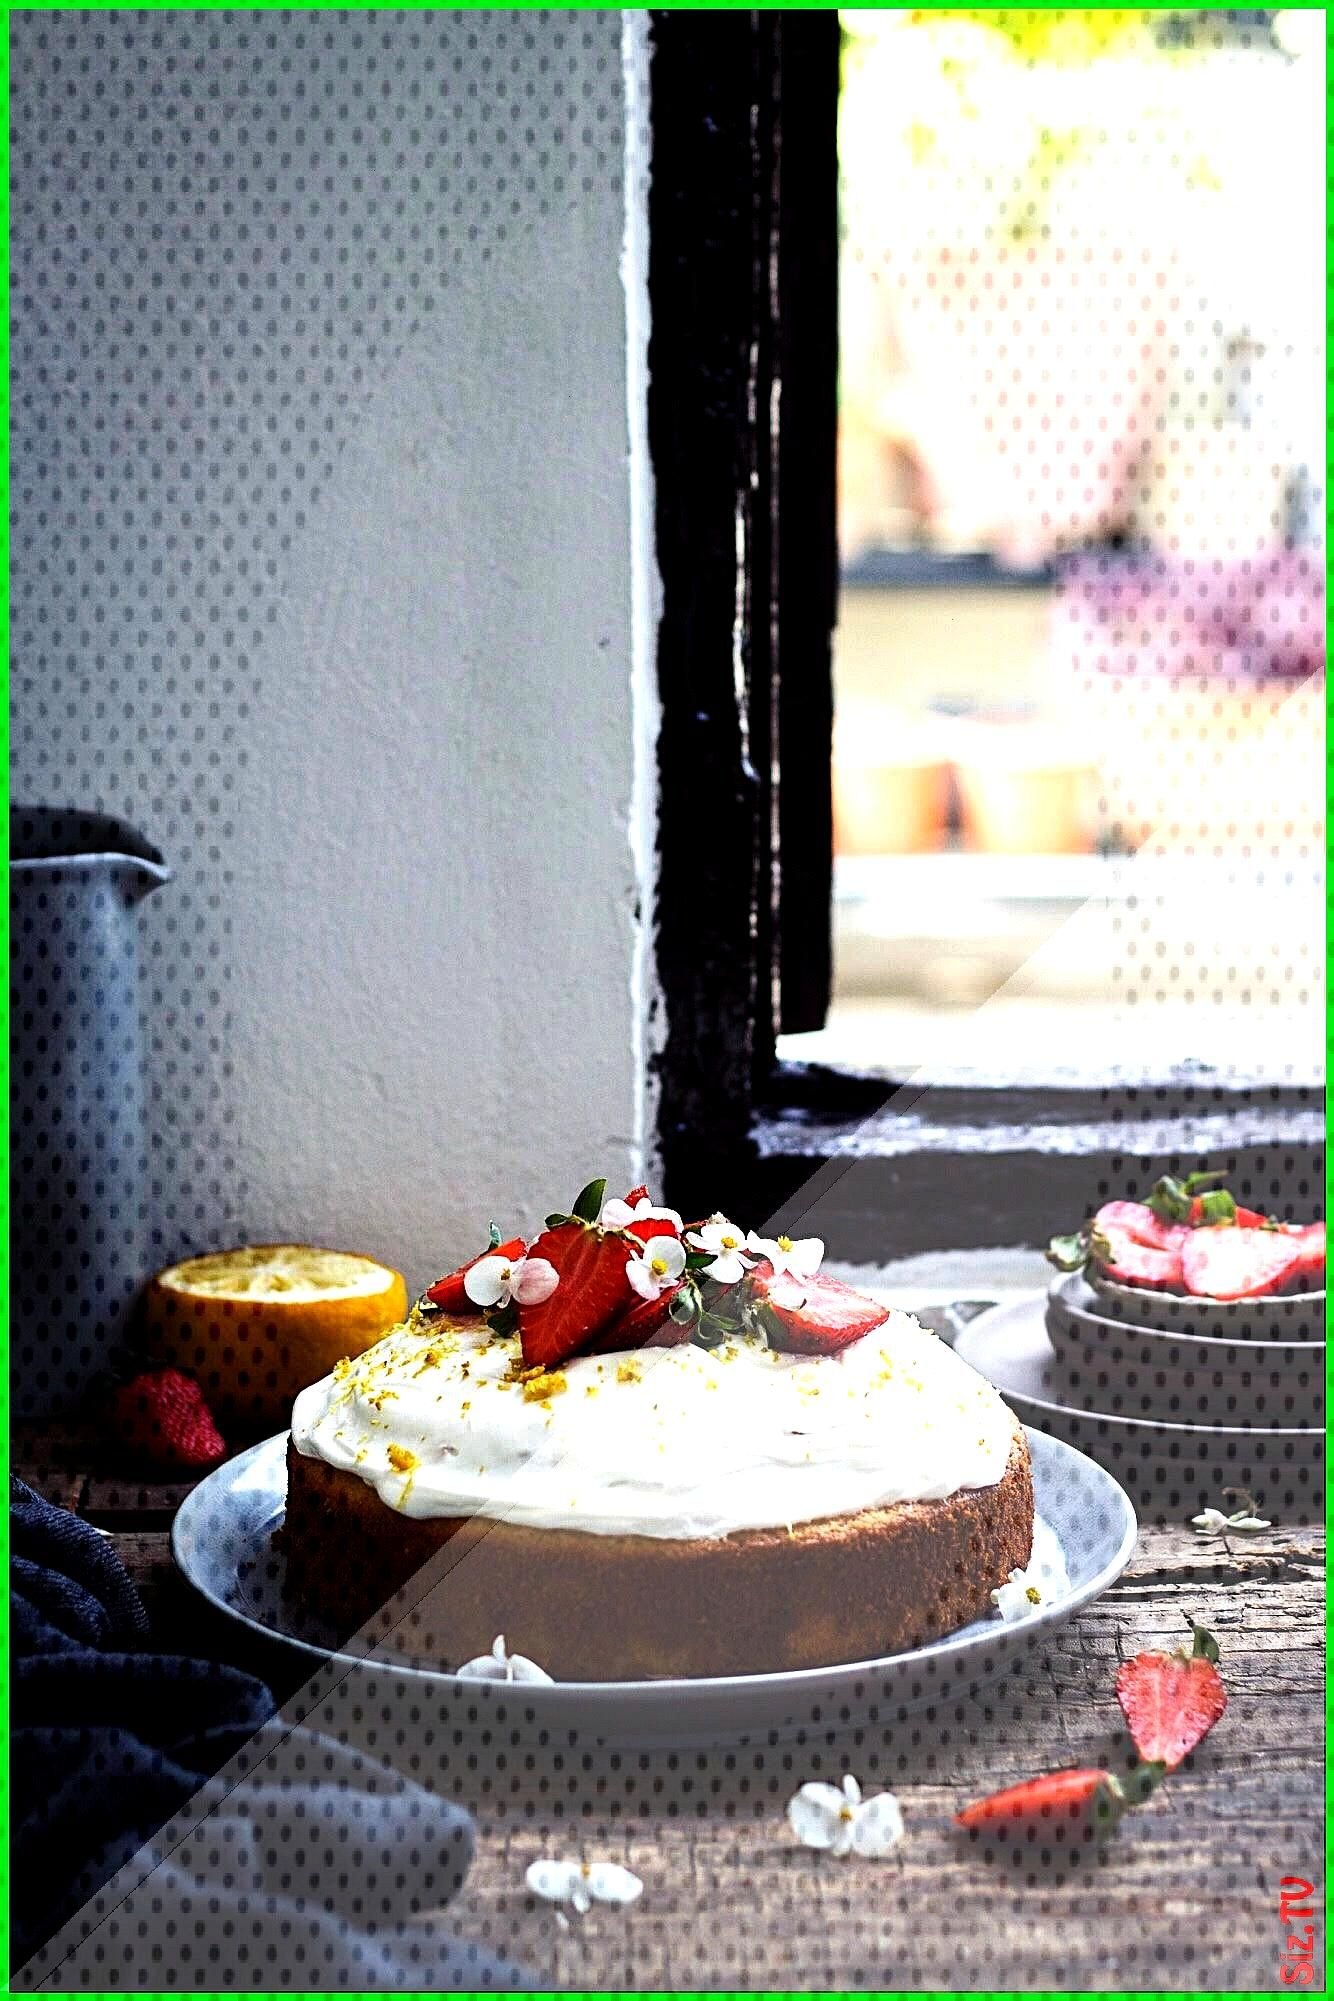 Eggless Lemon Cake Bake with Shivesh Eggless Lemon Cake Bake with Shivesh BAKE WITH SHIVESH bakew